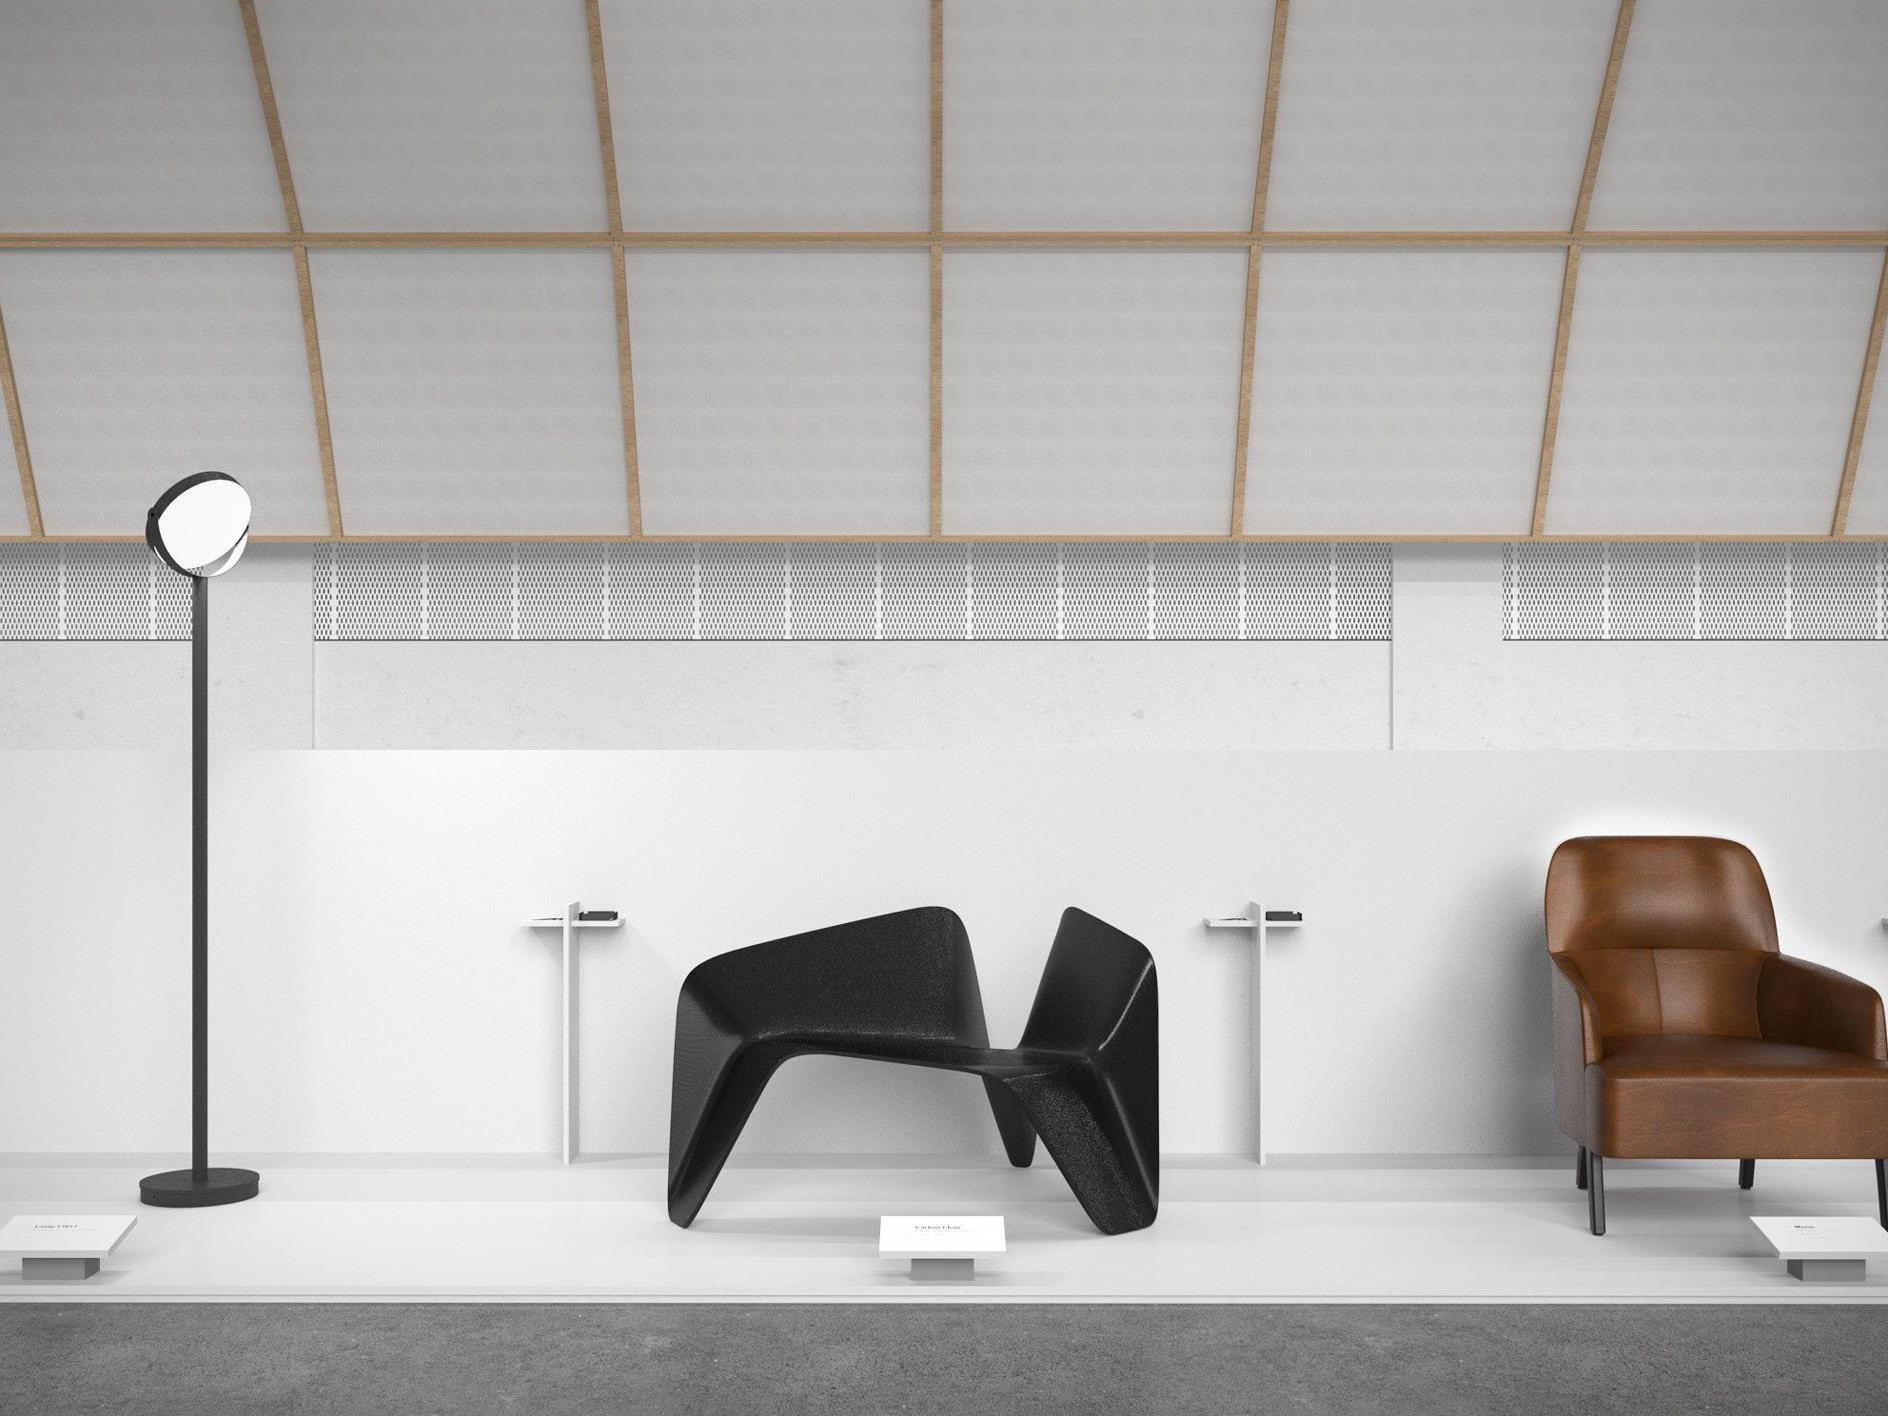 salone del mobile vorarlberger design bei gr ter m belmesse in mailand sch ner wohnen vol at. Black Bedroom Furniture Sets. Home Design Ideas